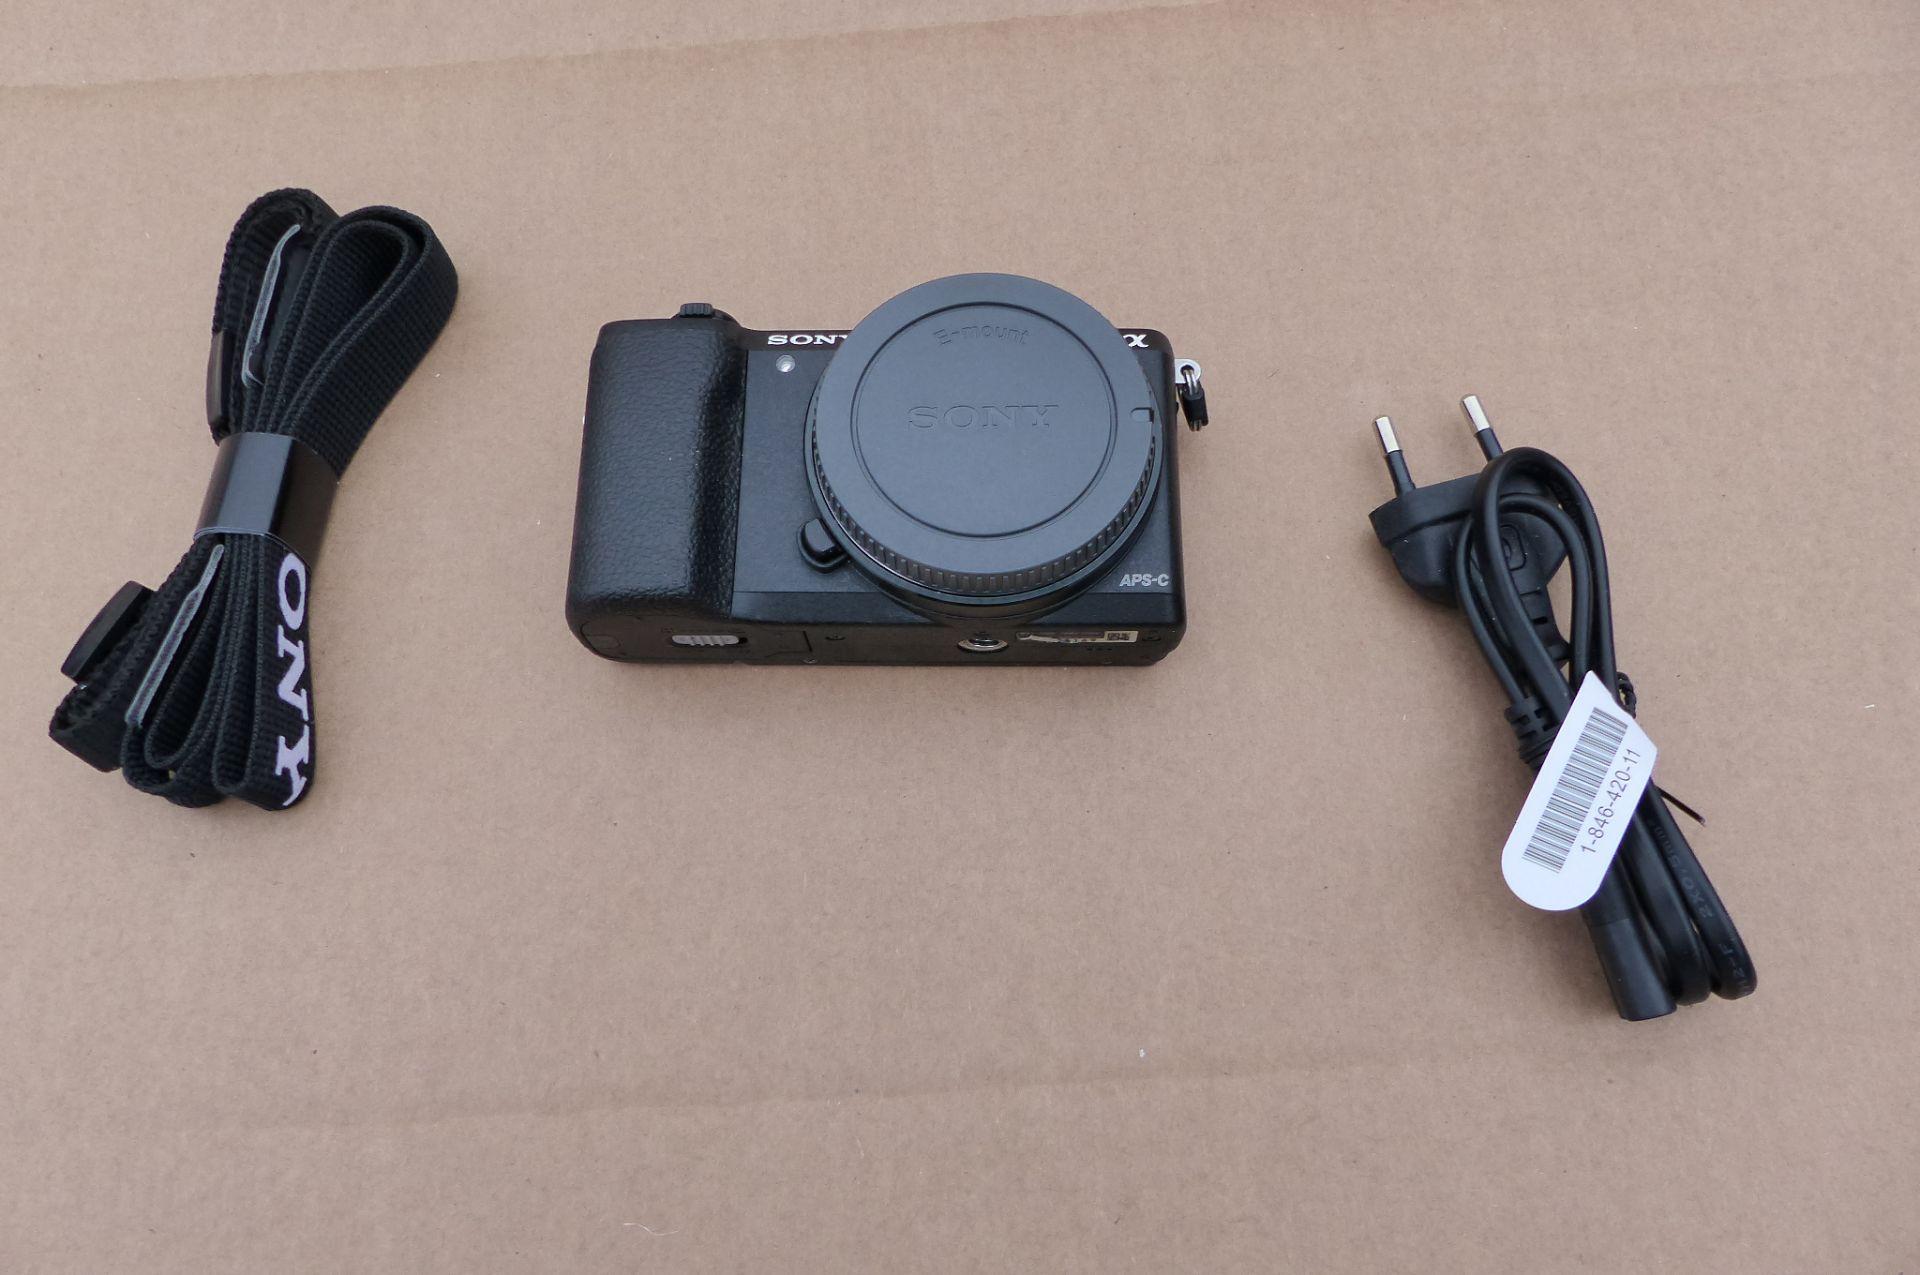 Sony 5100 camera - Image 2 of 3